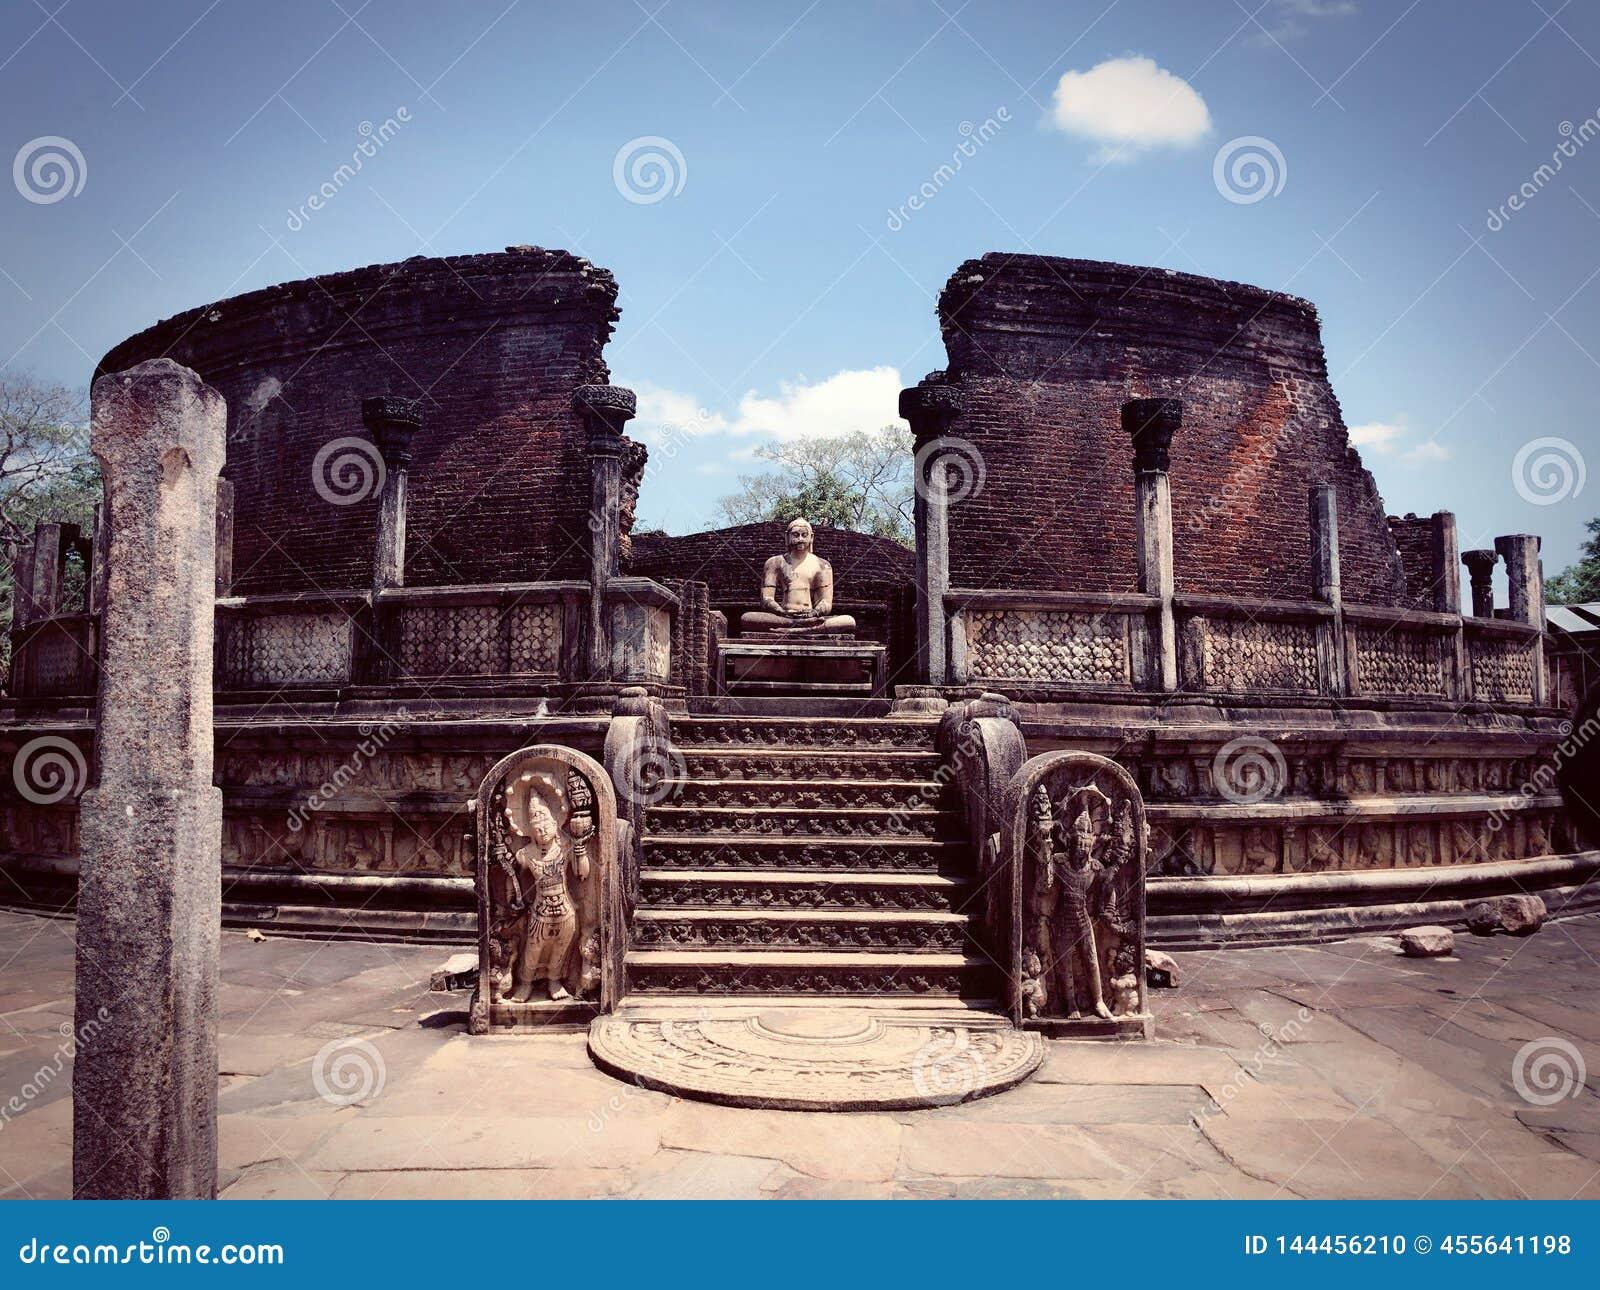 Statue of the Buddha in Polonnaruwa